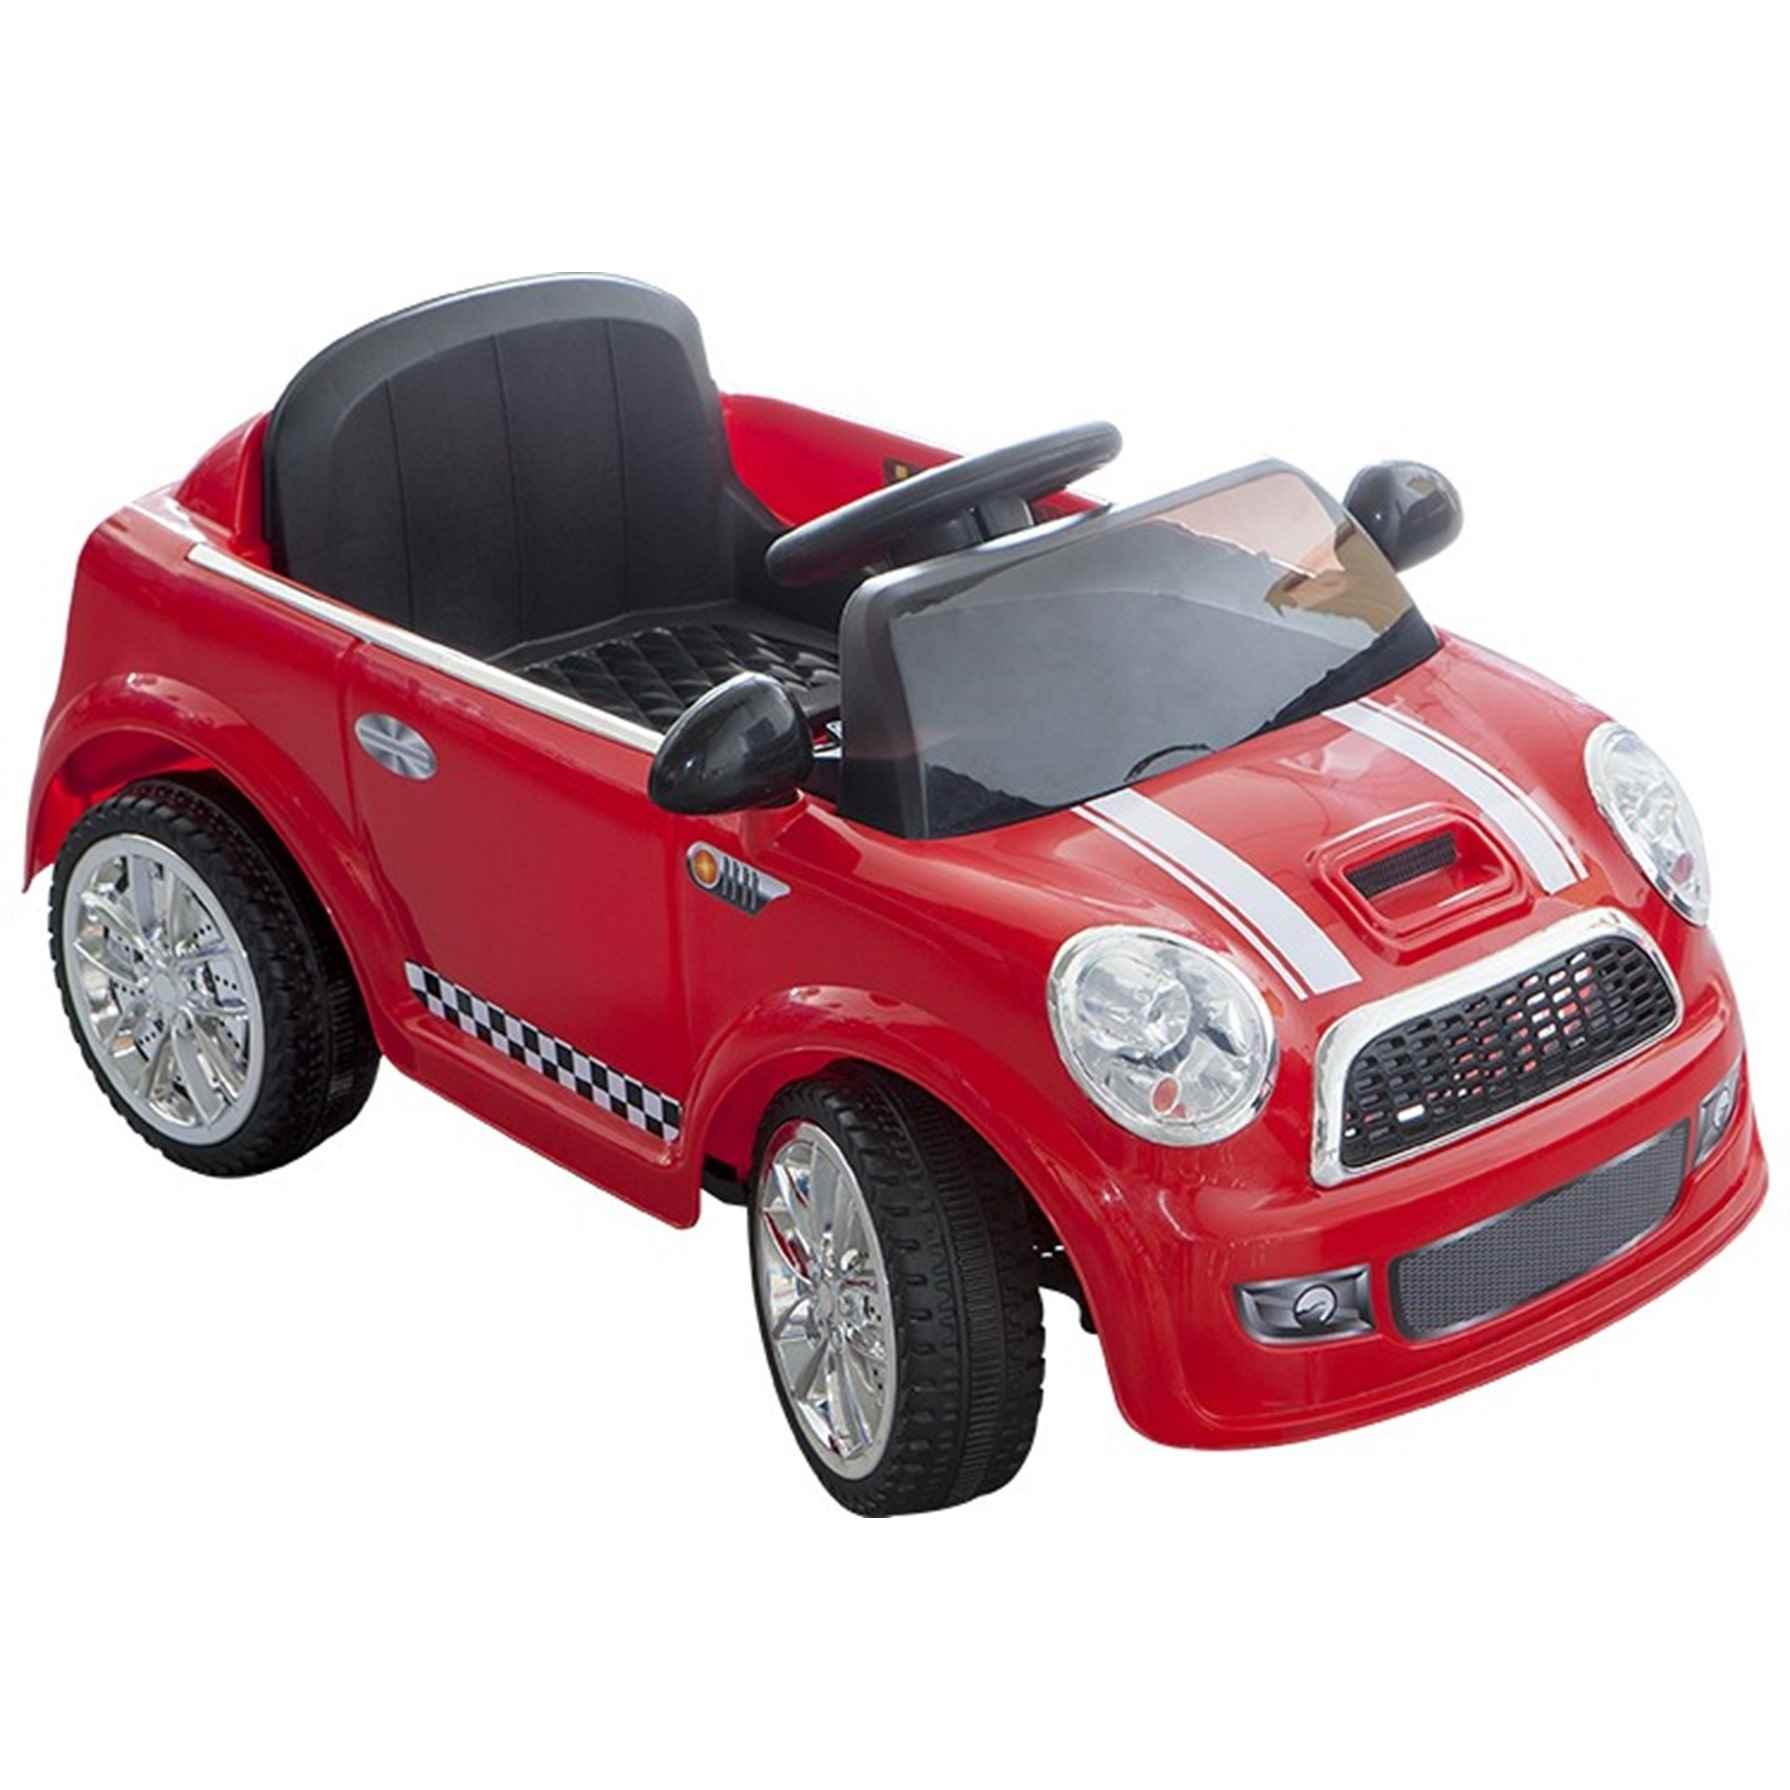 Coche Mini RC Rojo 6V la casita de dumbo